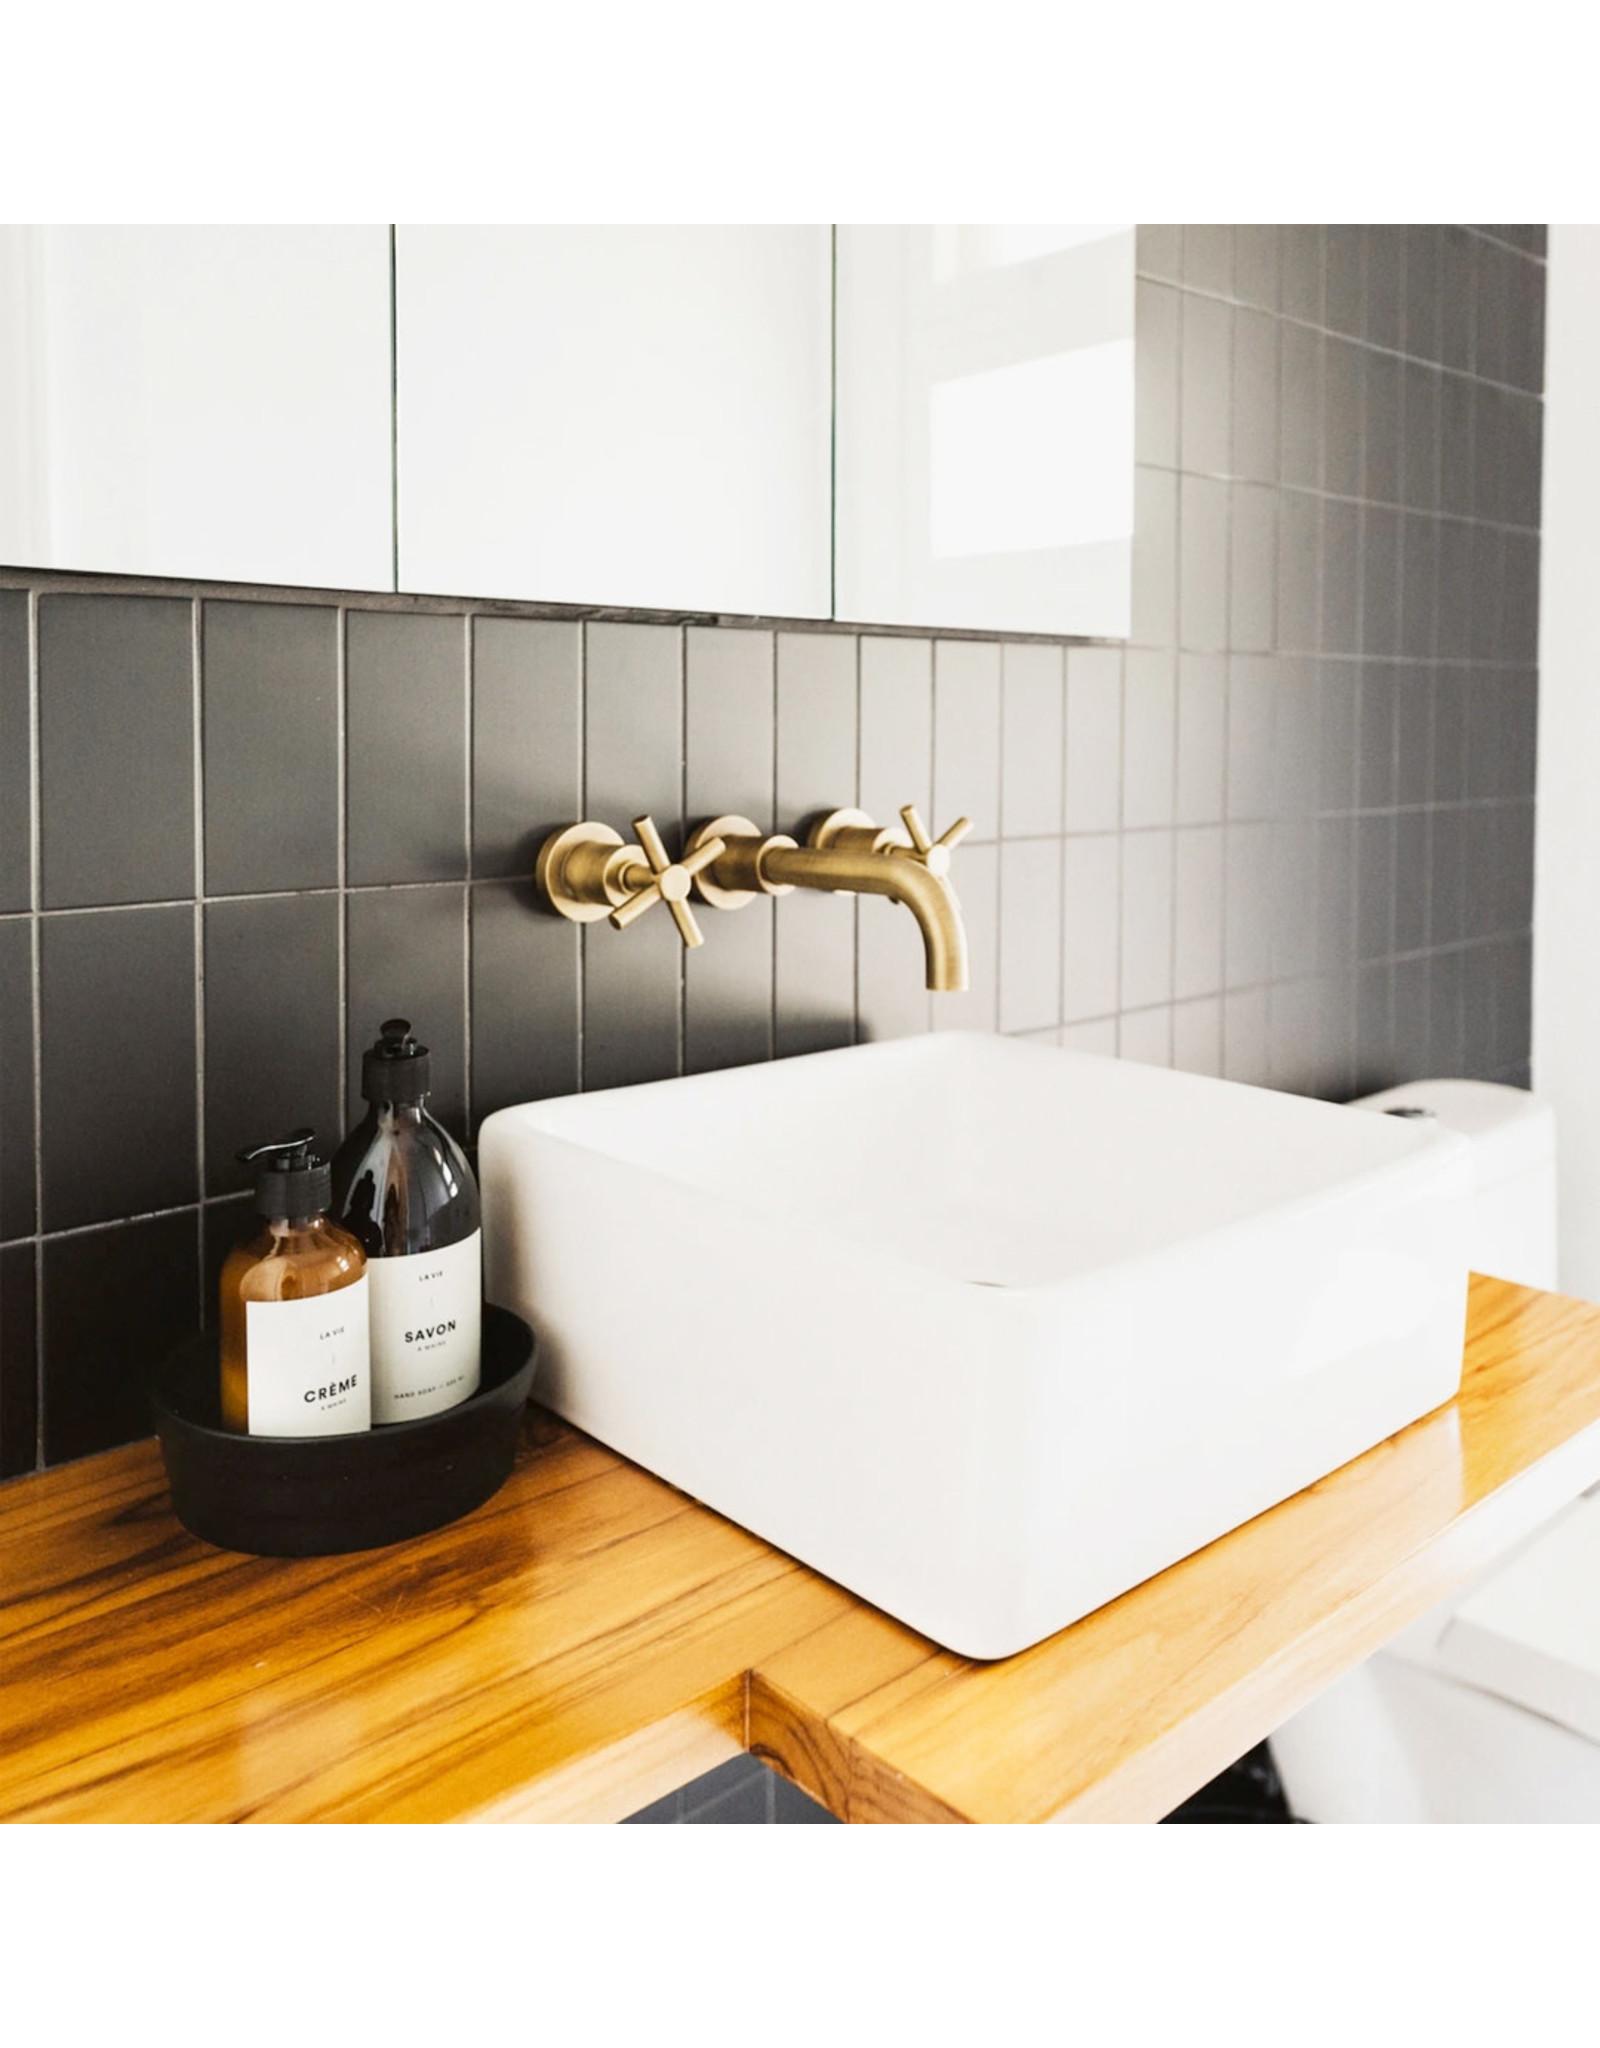 Hand Soap - Cypress Petitgrain